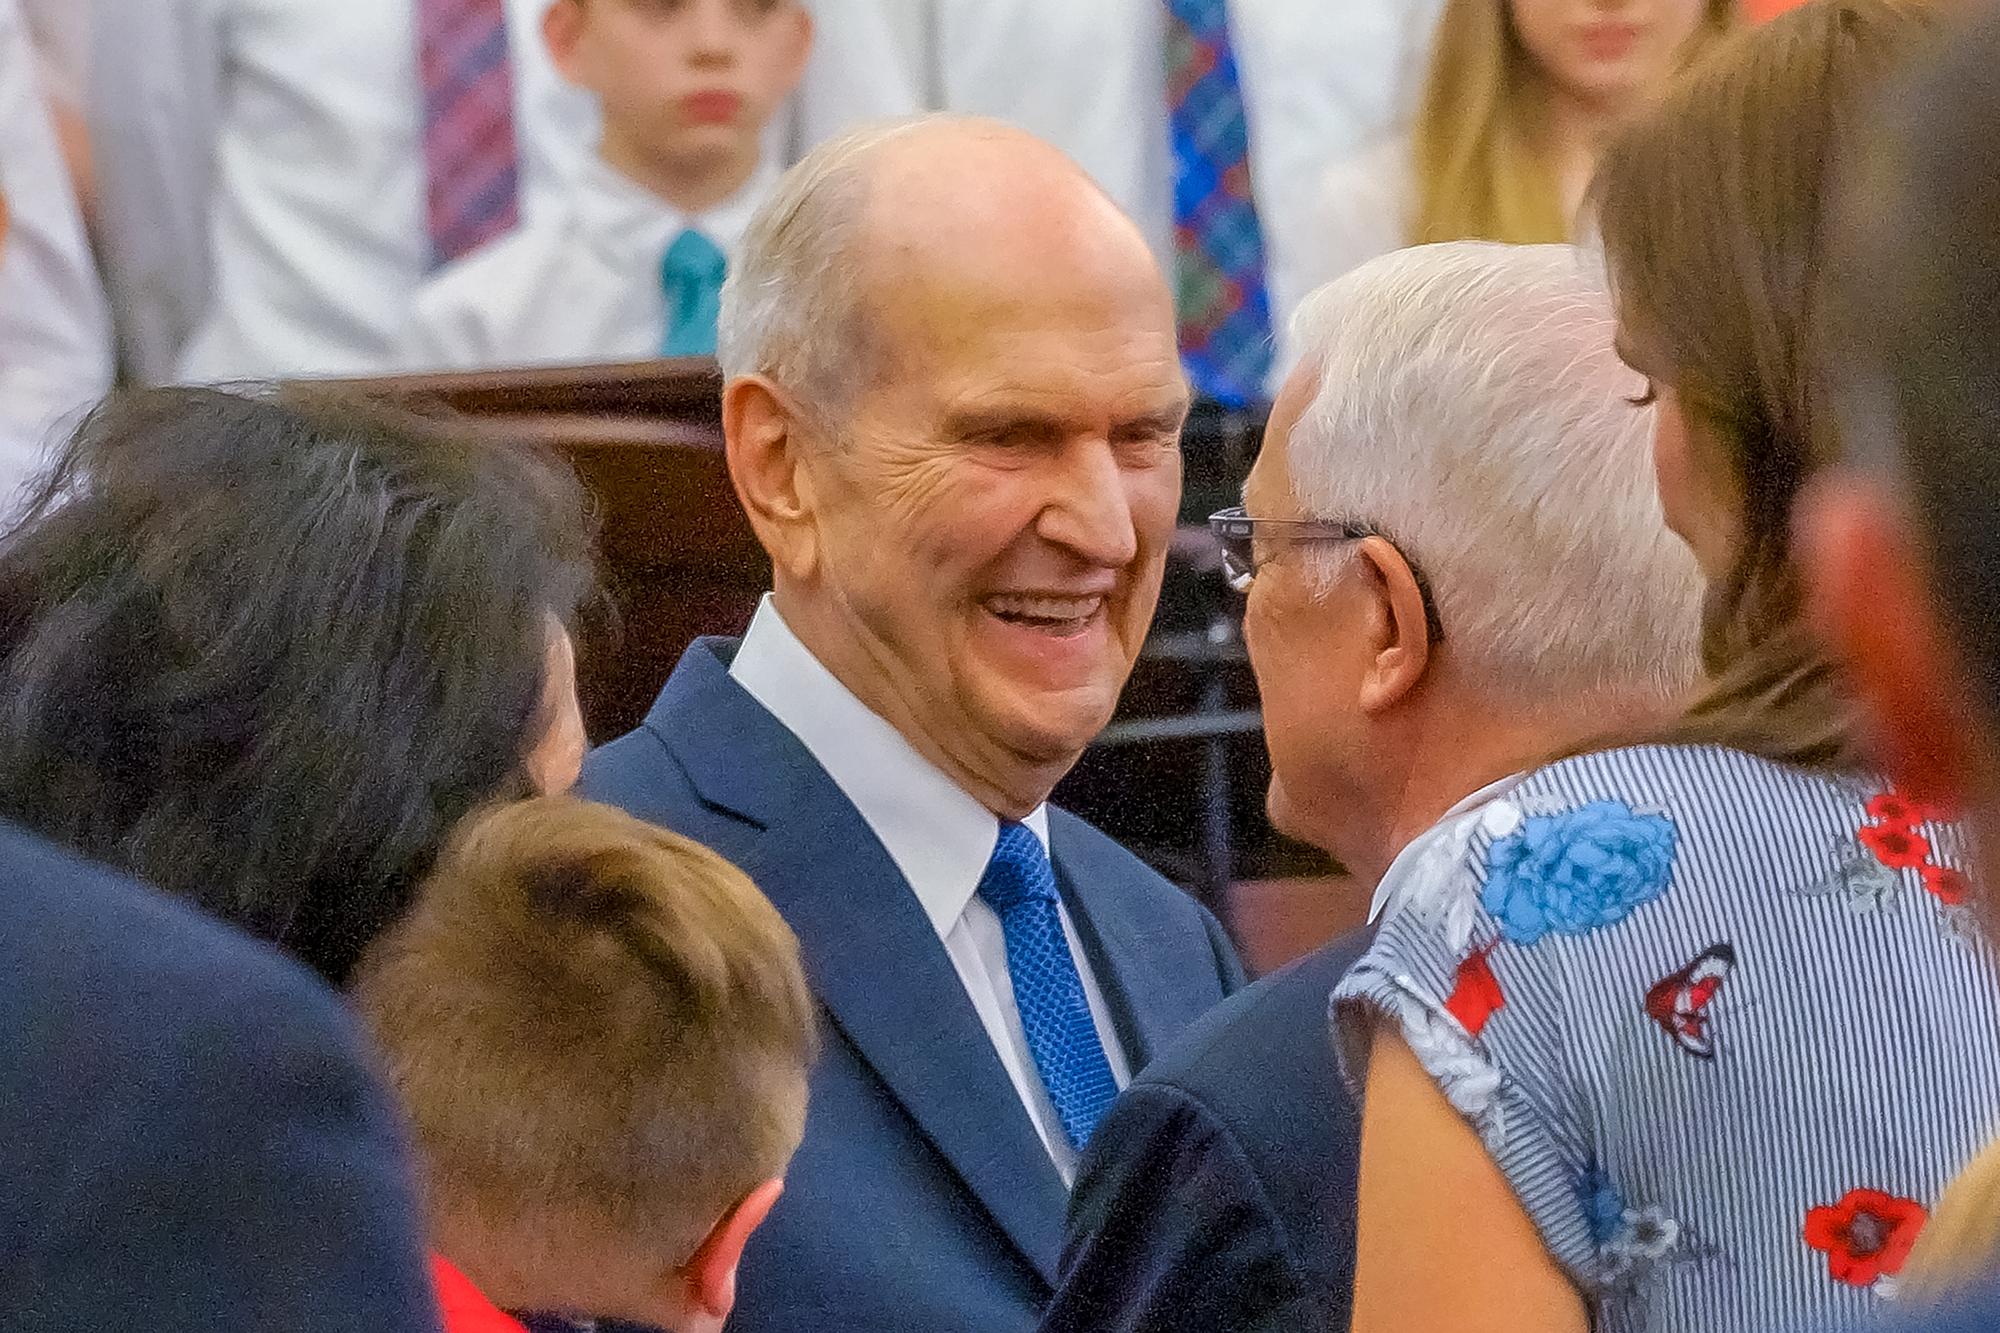 President Russell M. Nelson greets members on June 8, 2018, in Edmonton, Alberta.